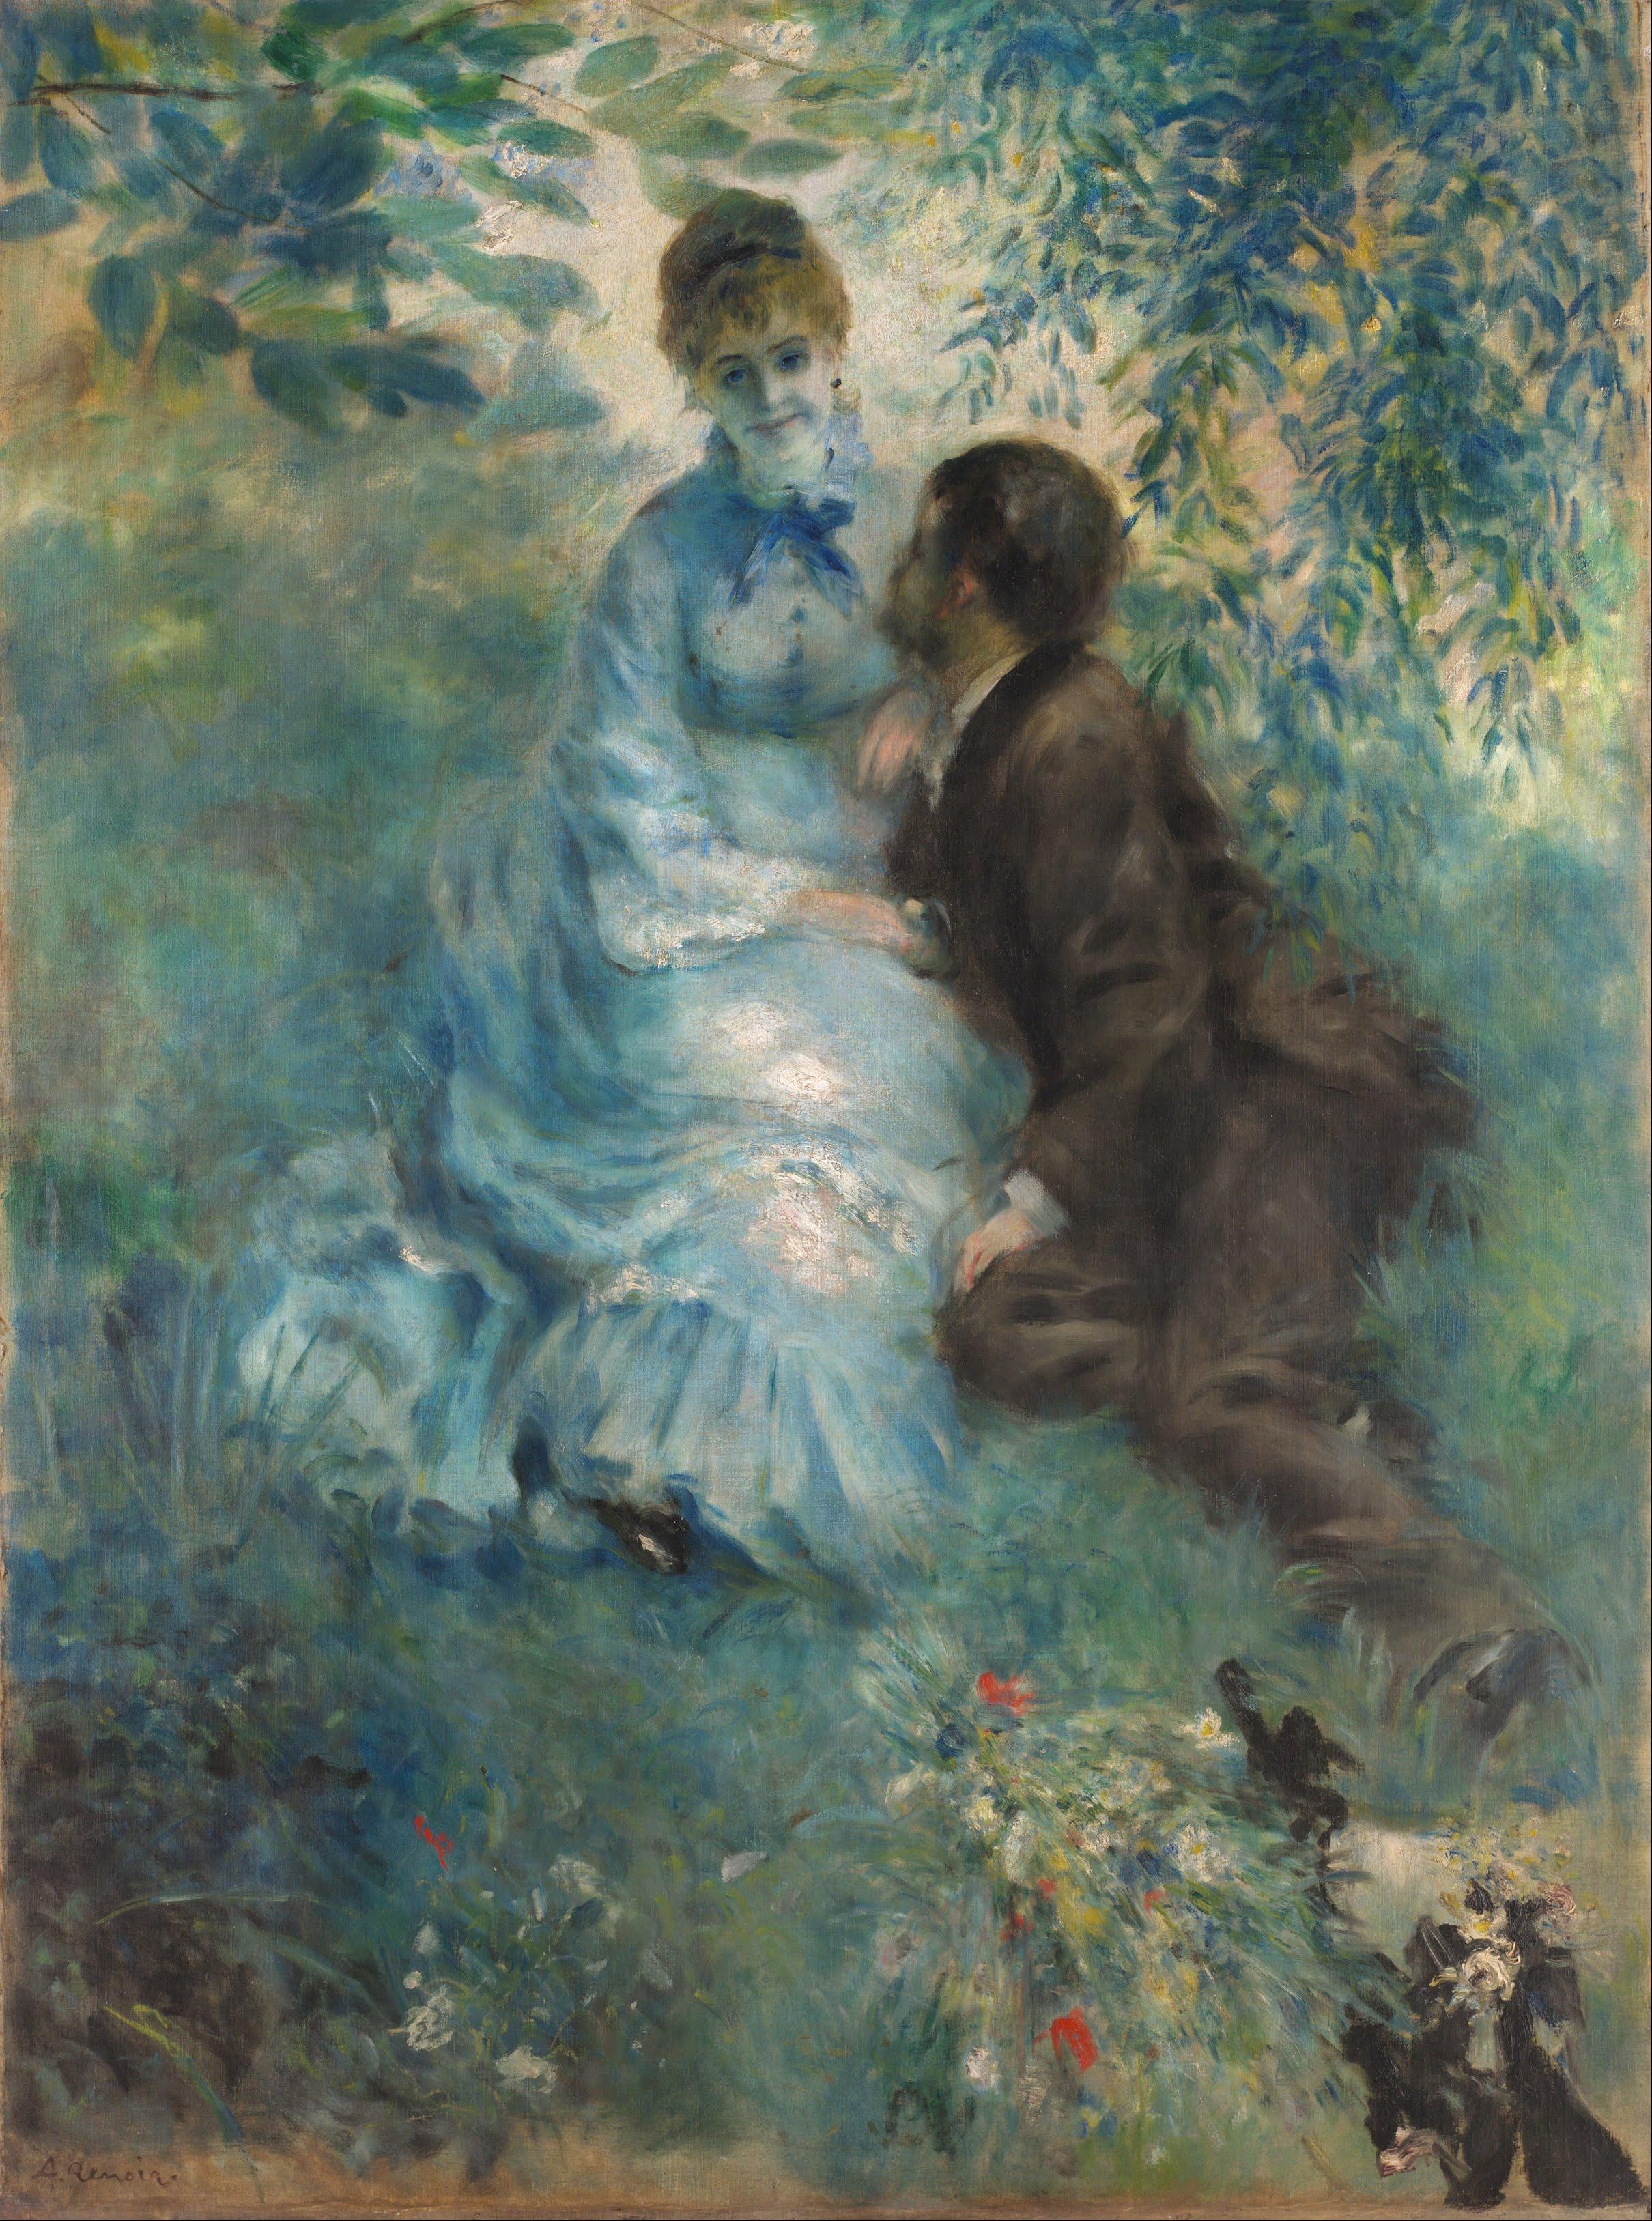 Pierre-Auguste Renoir, Public domain, via Wikimedia Commons